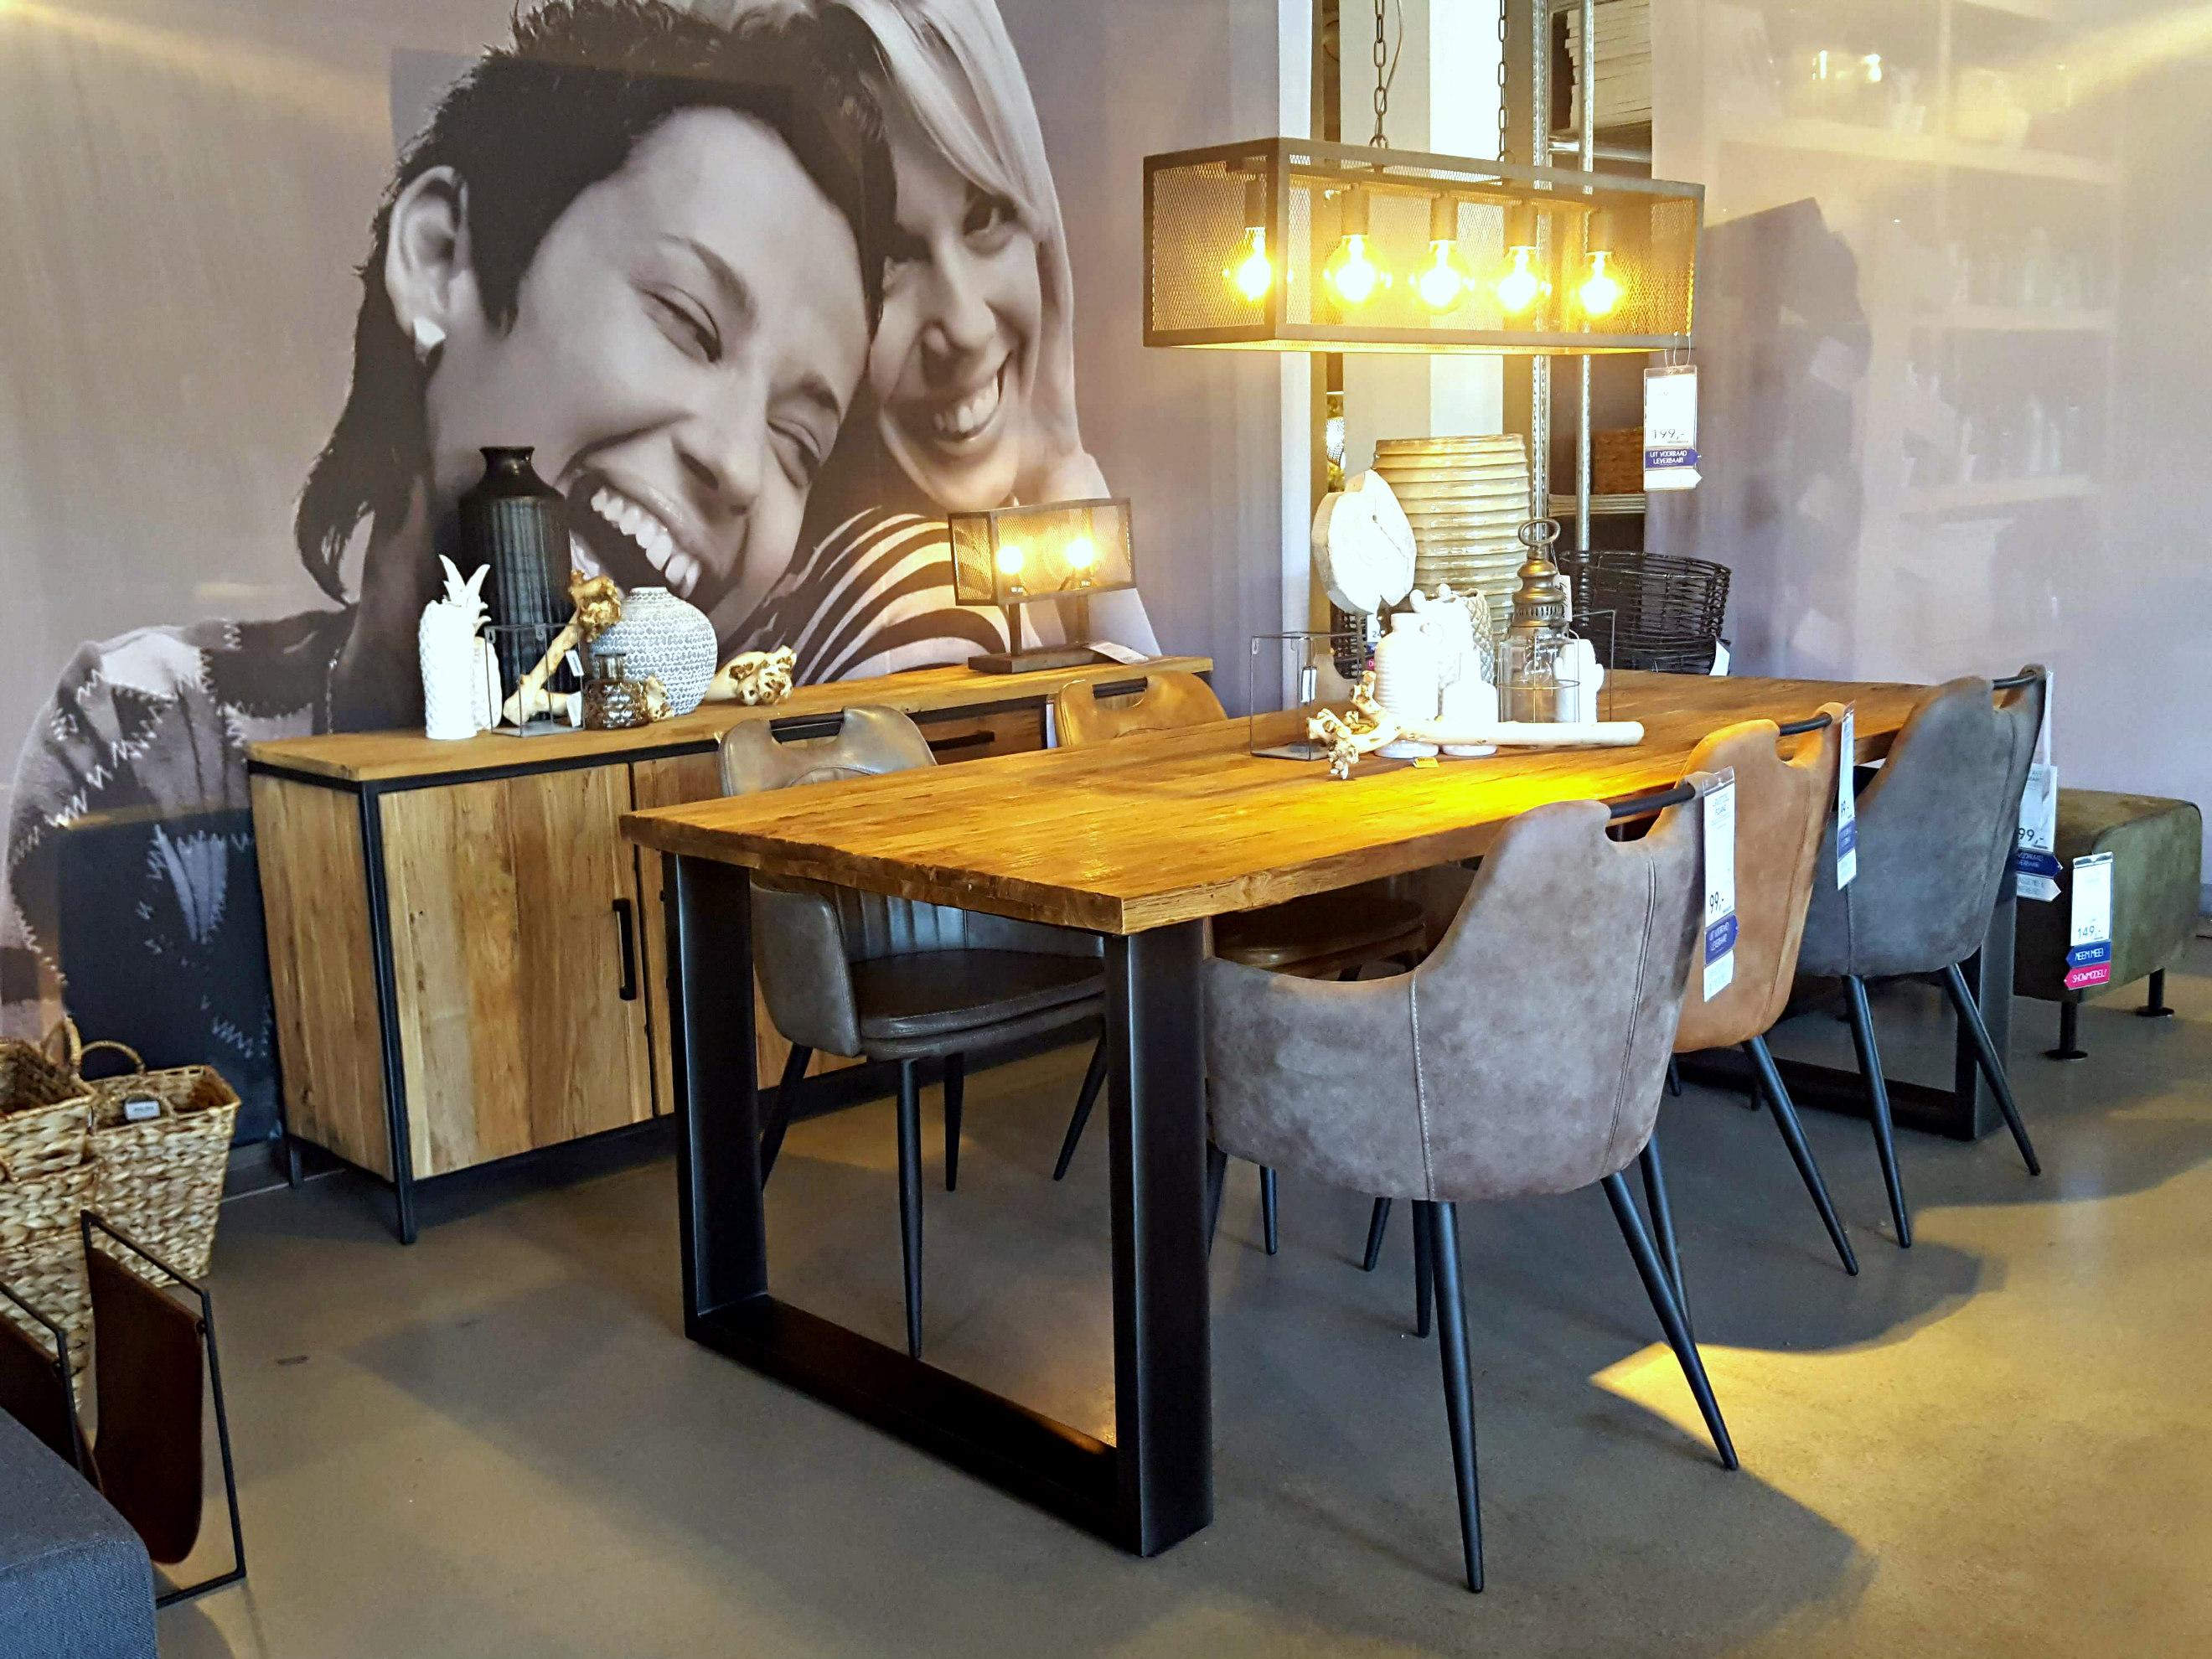 Robuuste tafel lamp eettafel industriele tafel woonkamer Woonkamer tafel